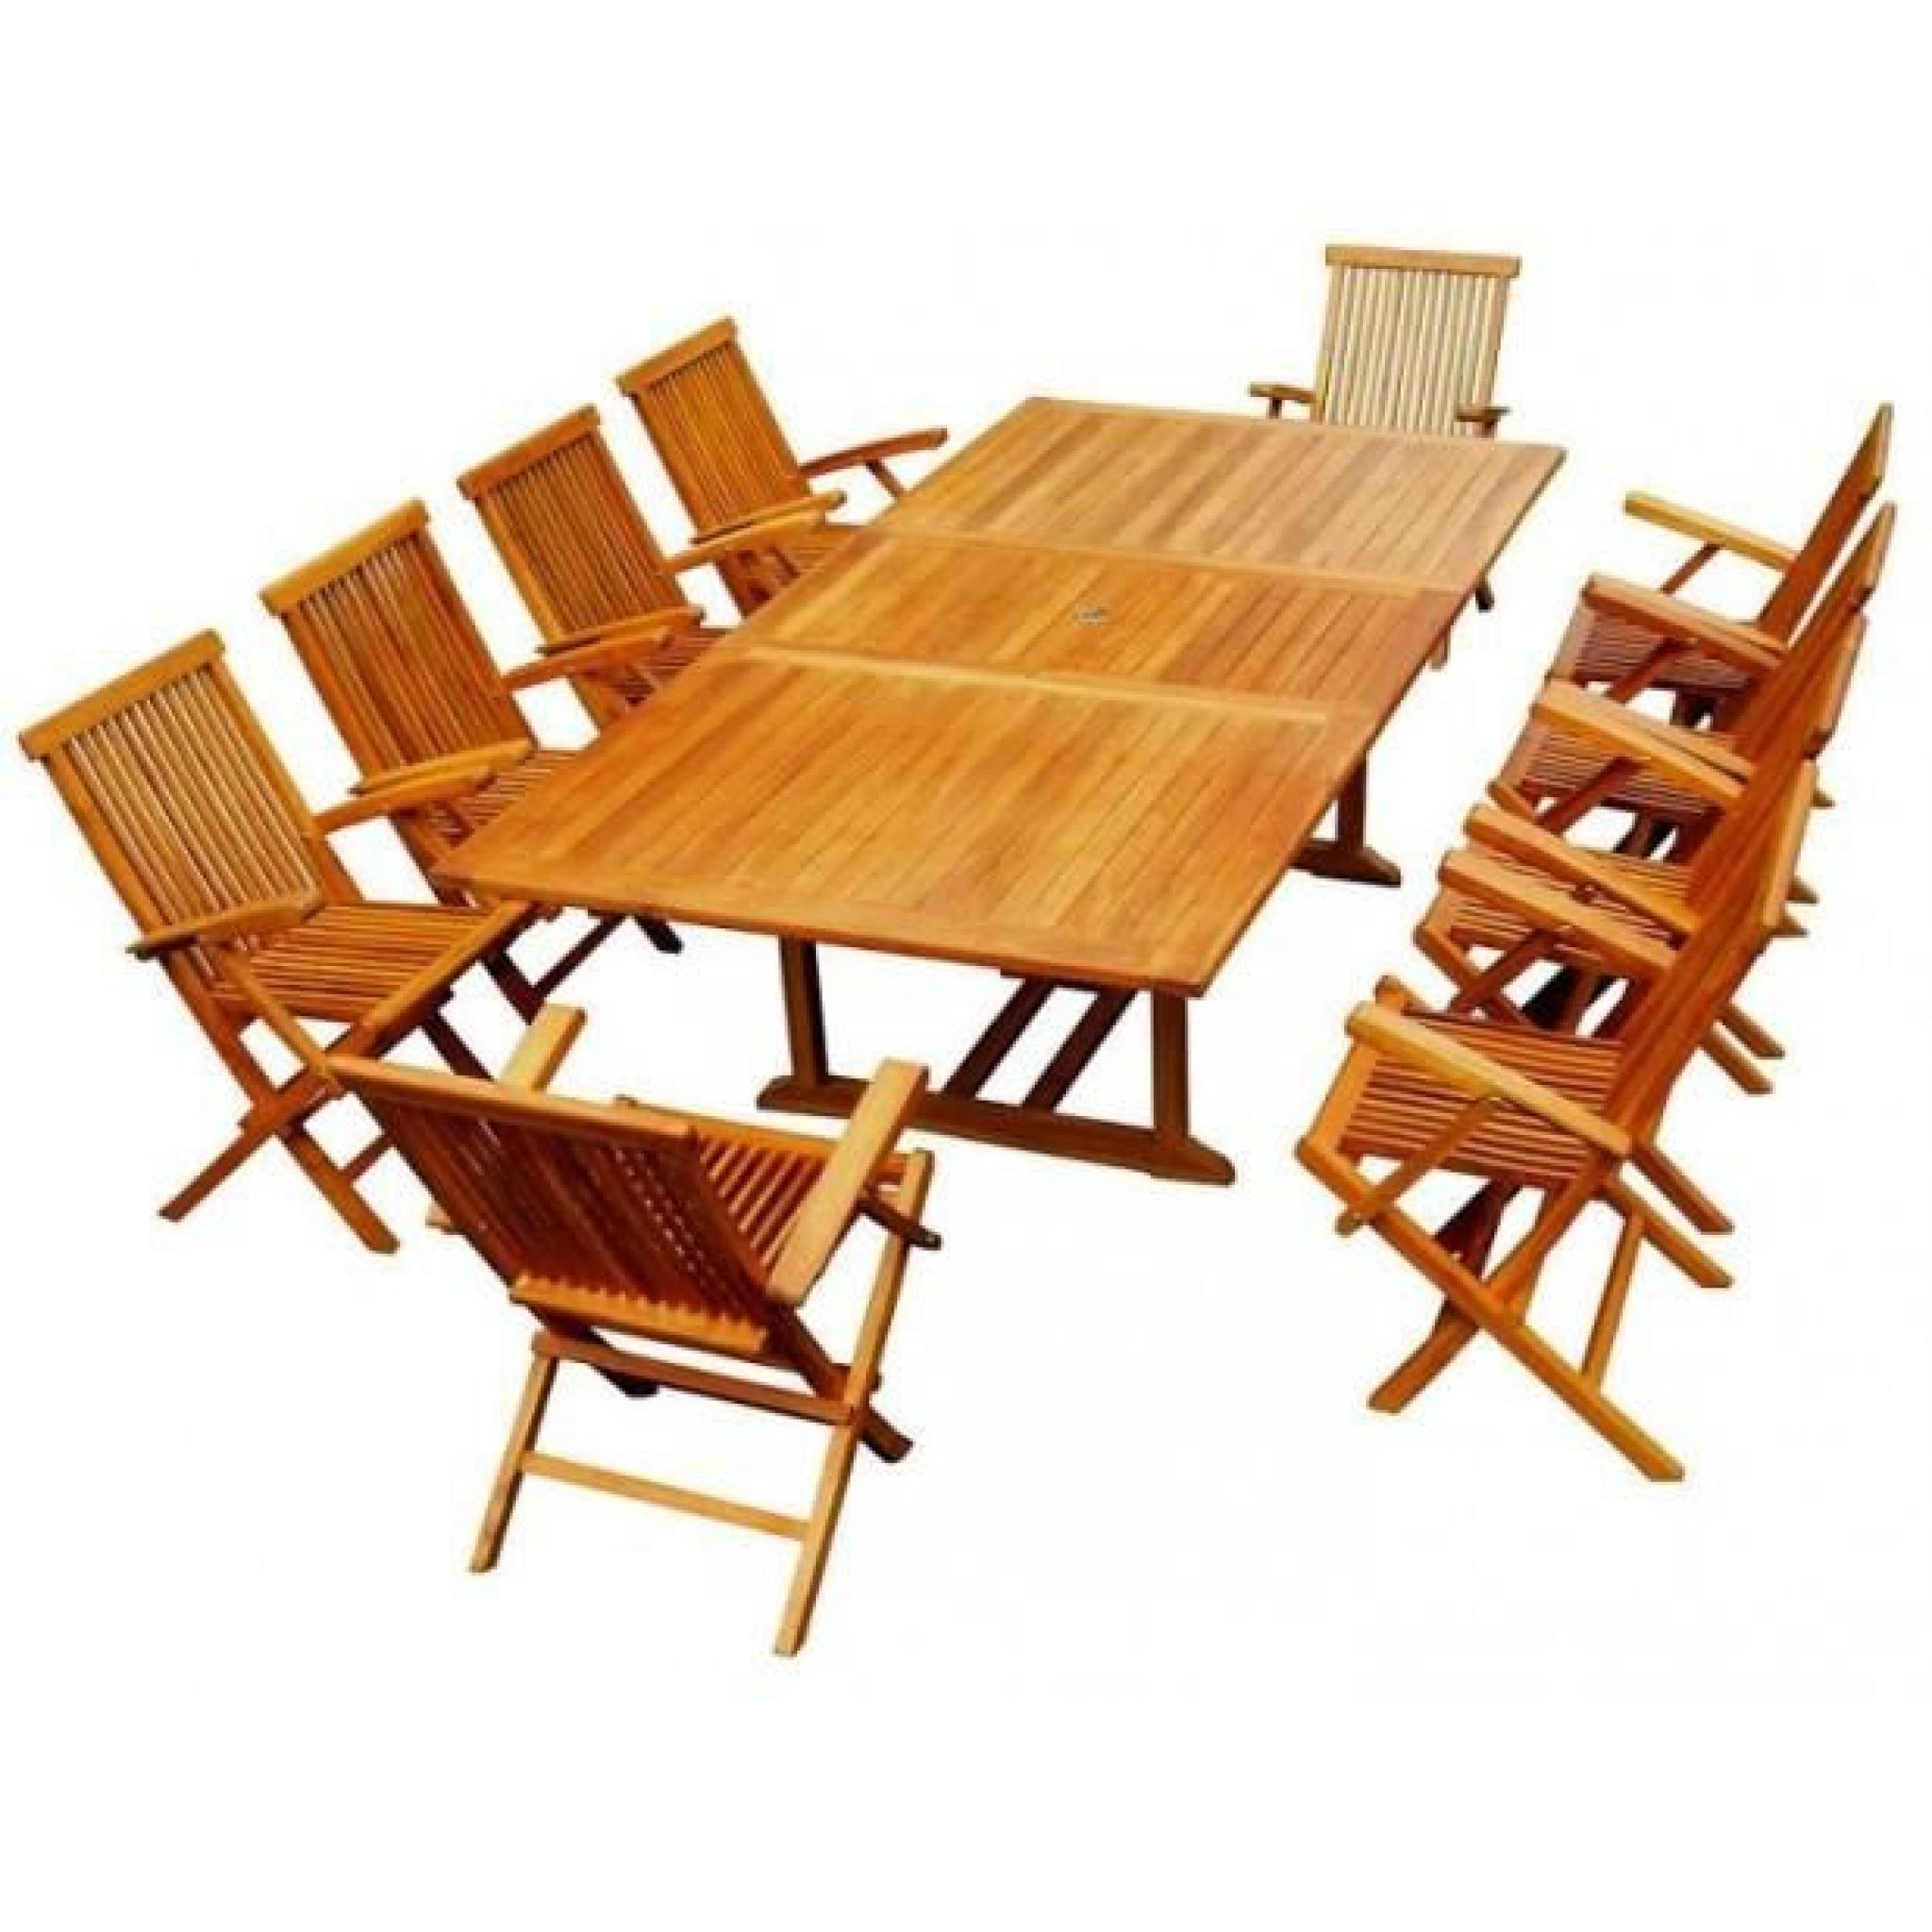 Magnifique salon de jardin teck \'huilé\' 10/12 pers -100% fauteuils+ ...